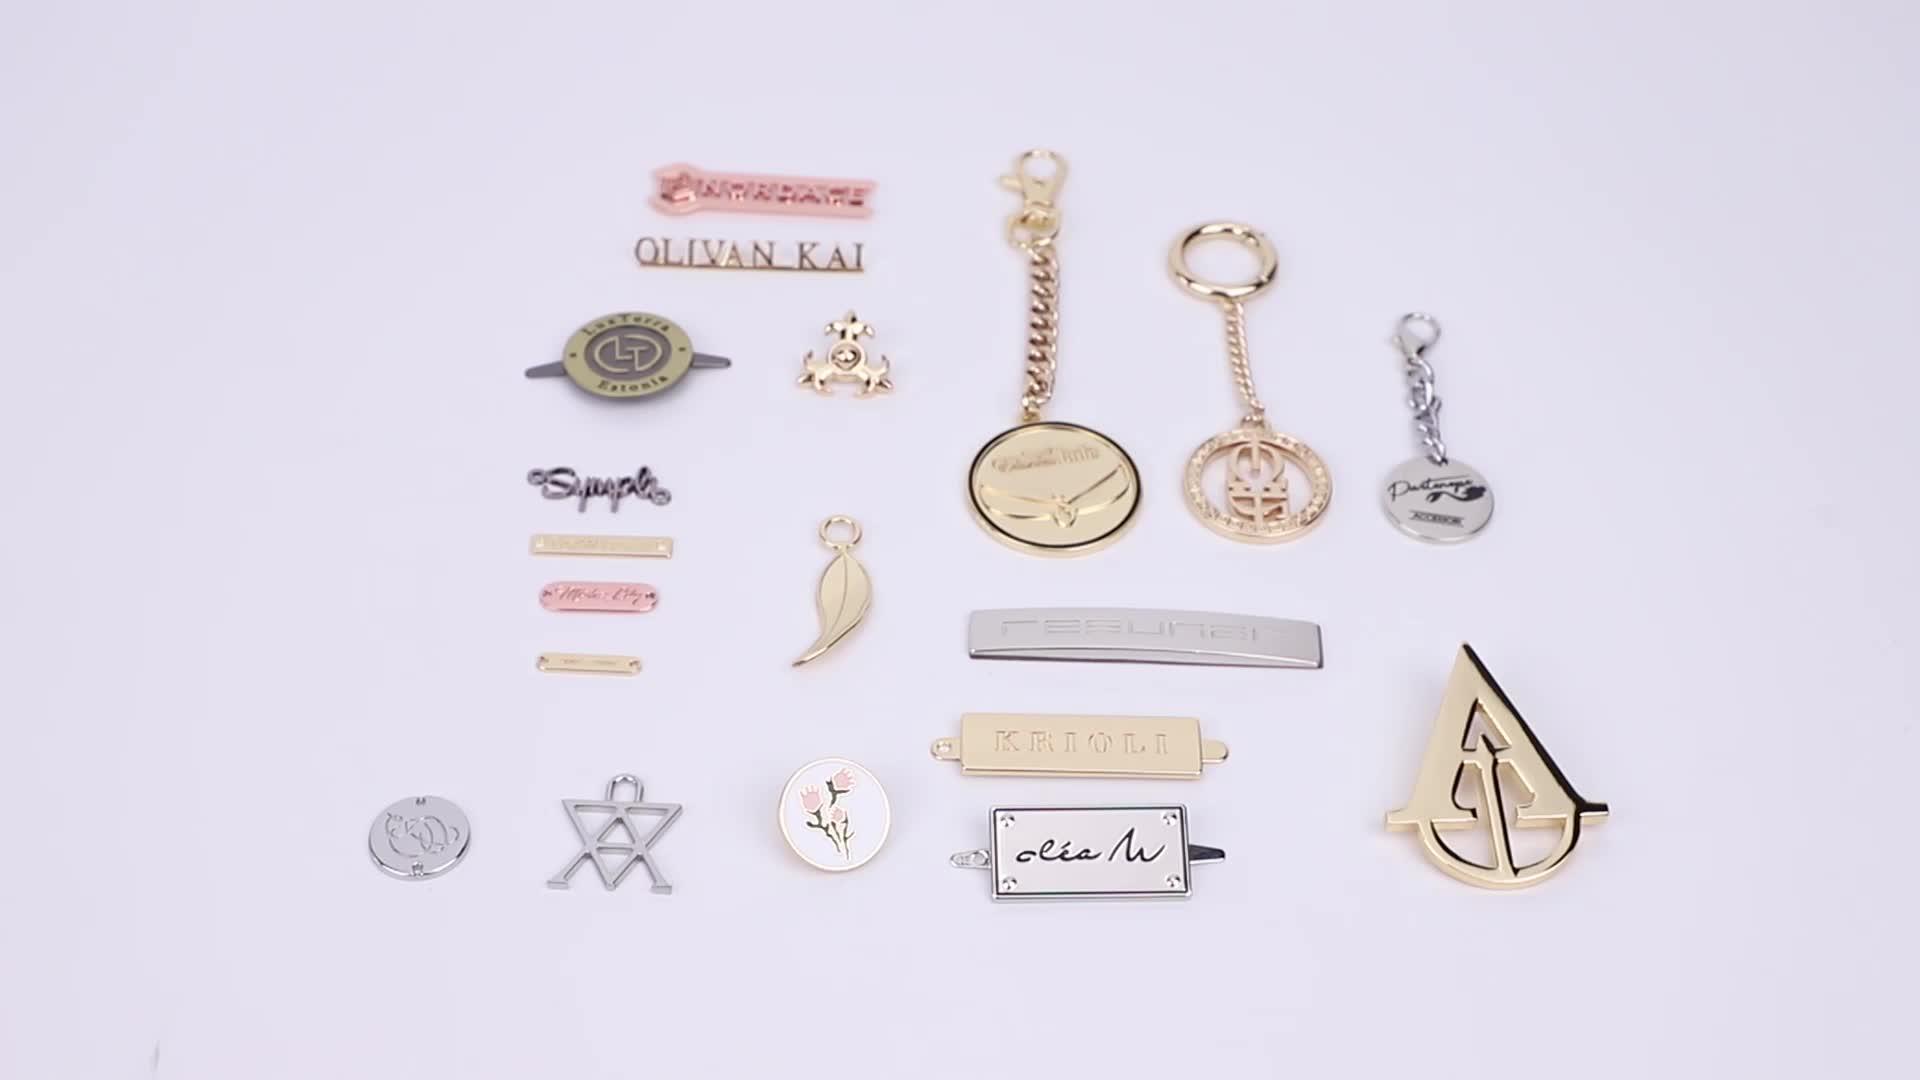 OEM ODM Fashion Bag Accessories Making Metal Embossed Name Plate Logo Tag,Custom Engraved Metal Brand Logo Labels For Handbags